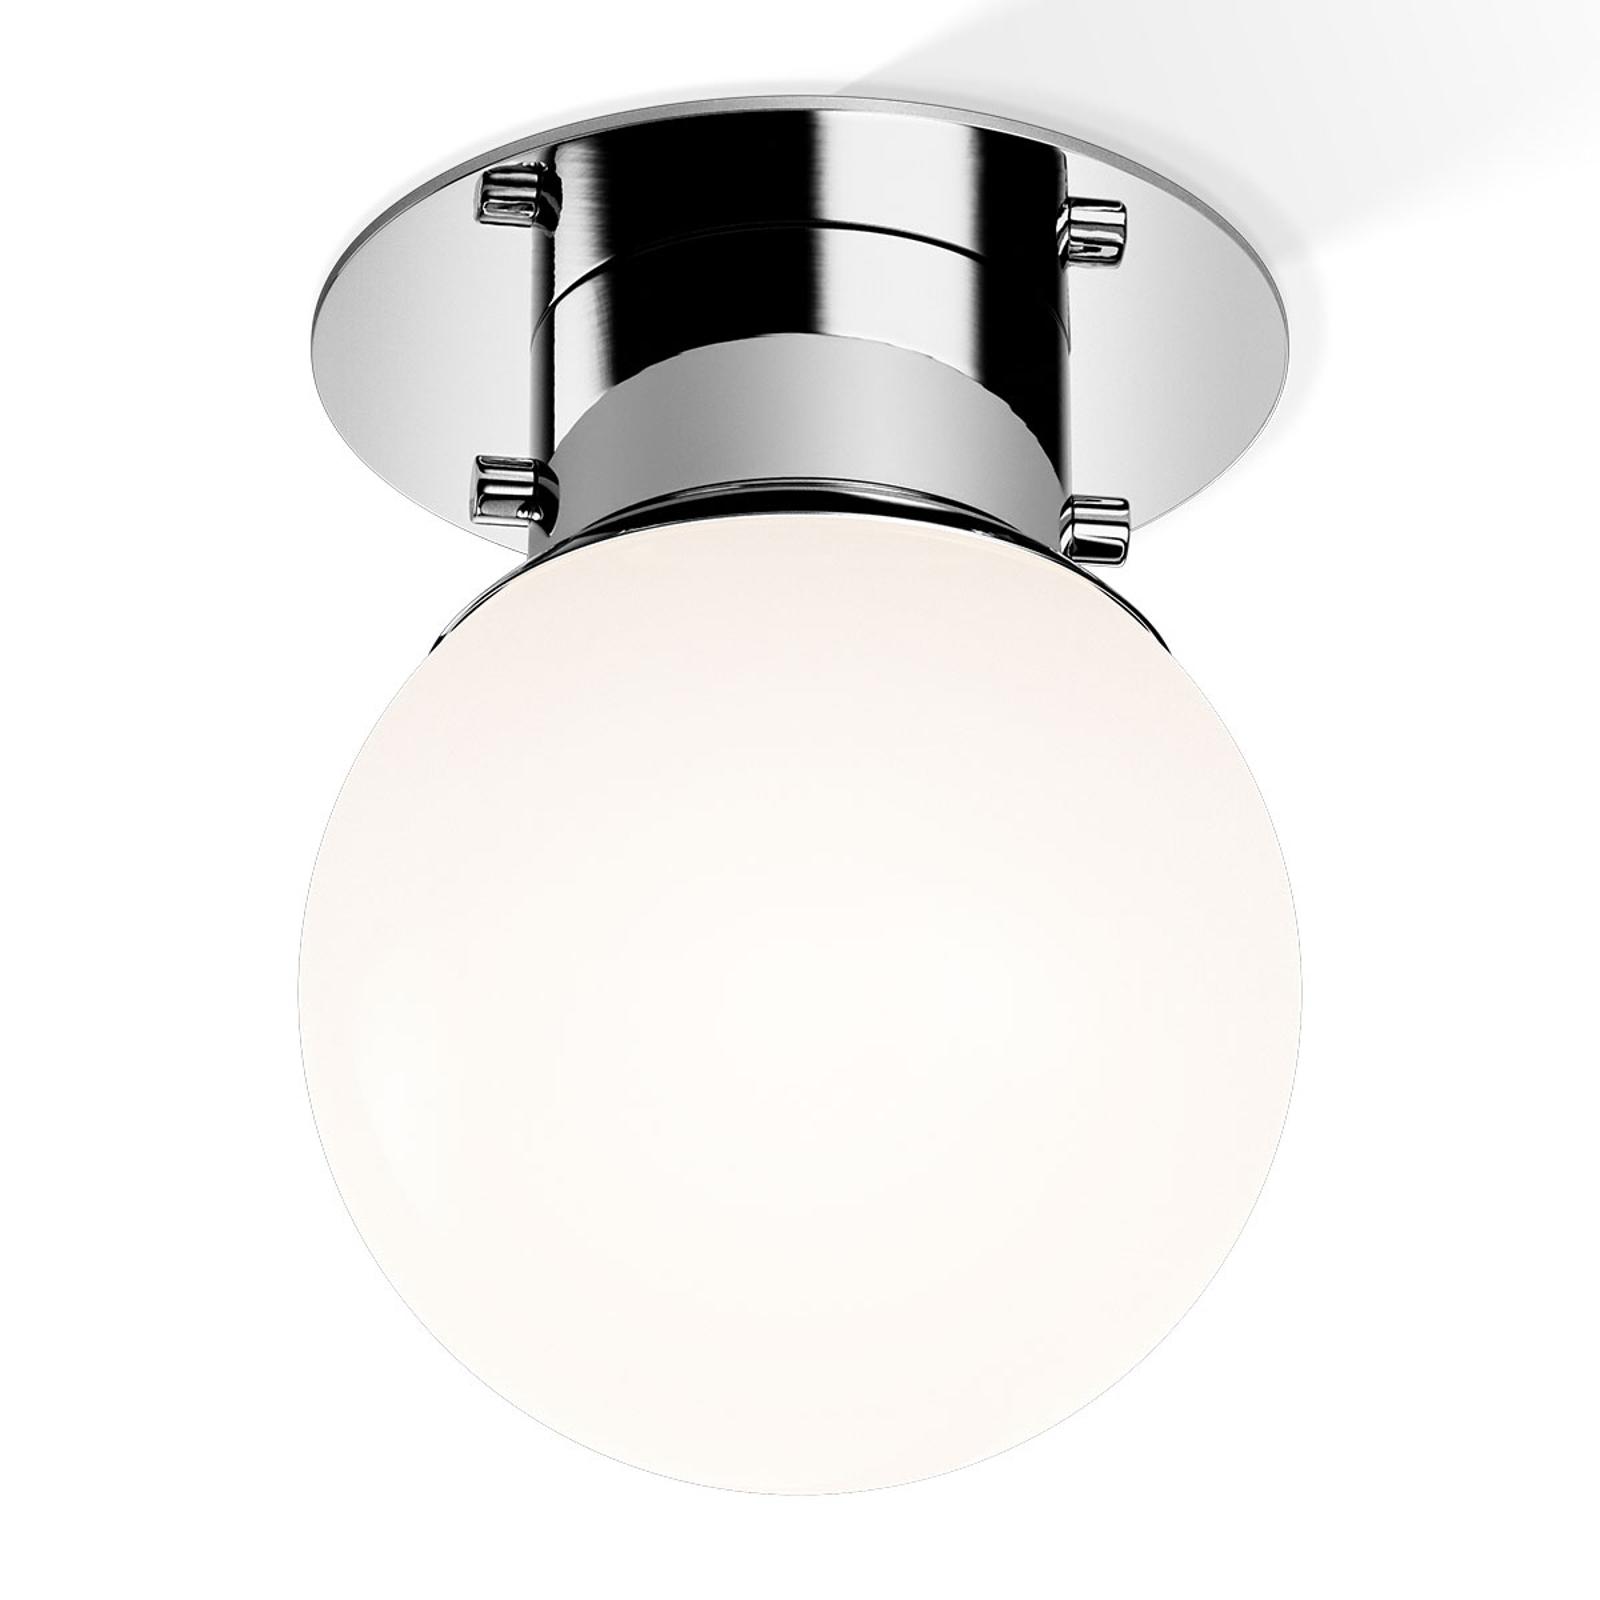 Clásica lámpara de techo esférica GLOBE cromo